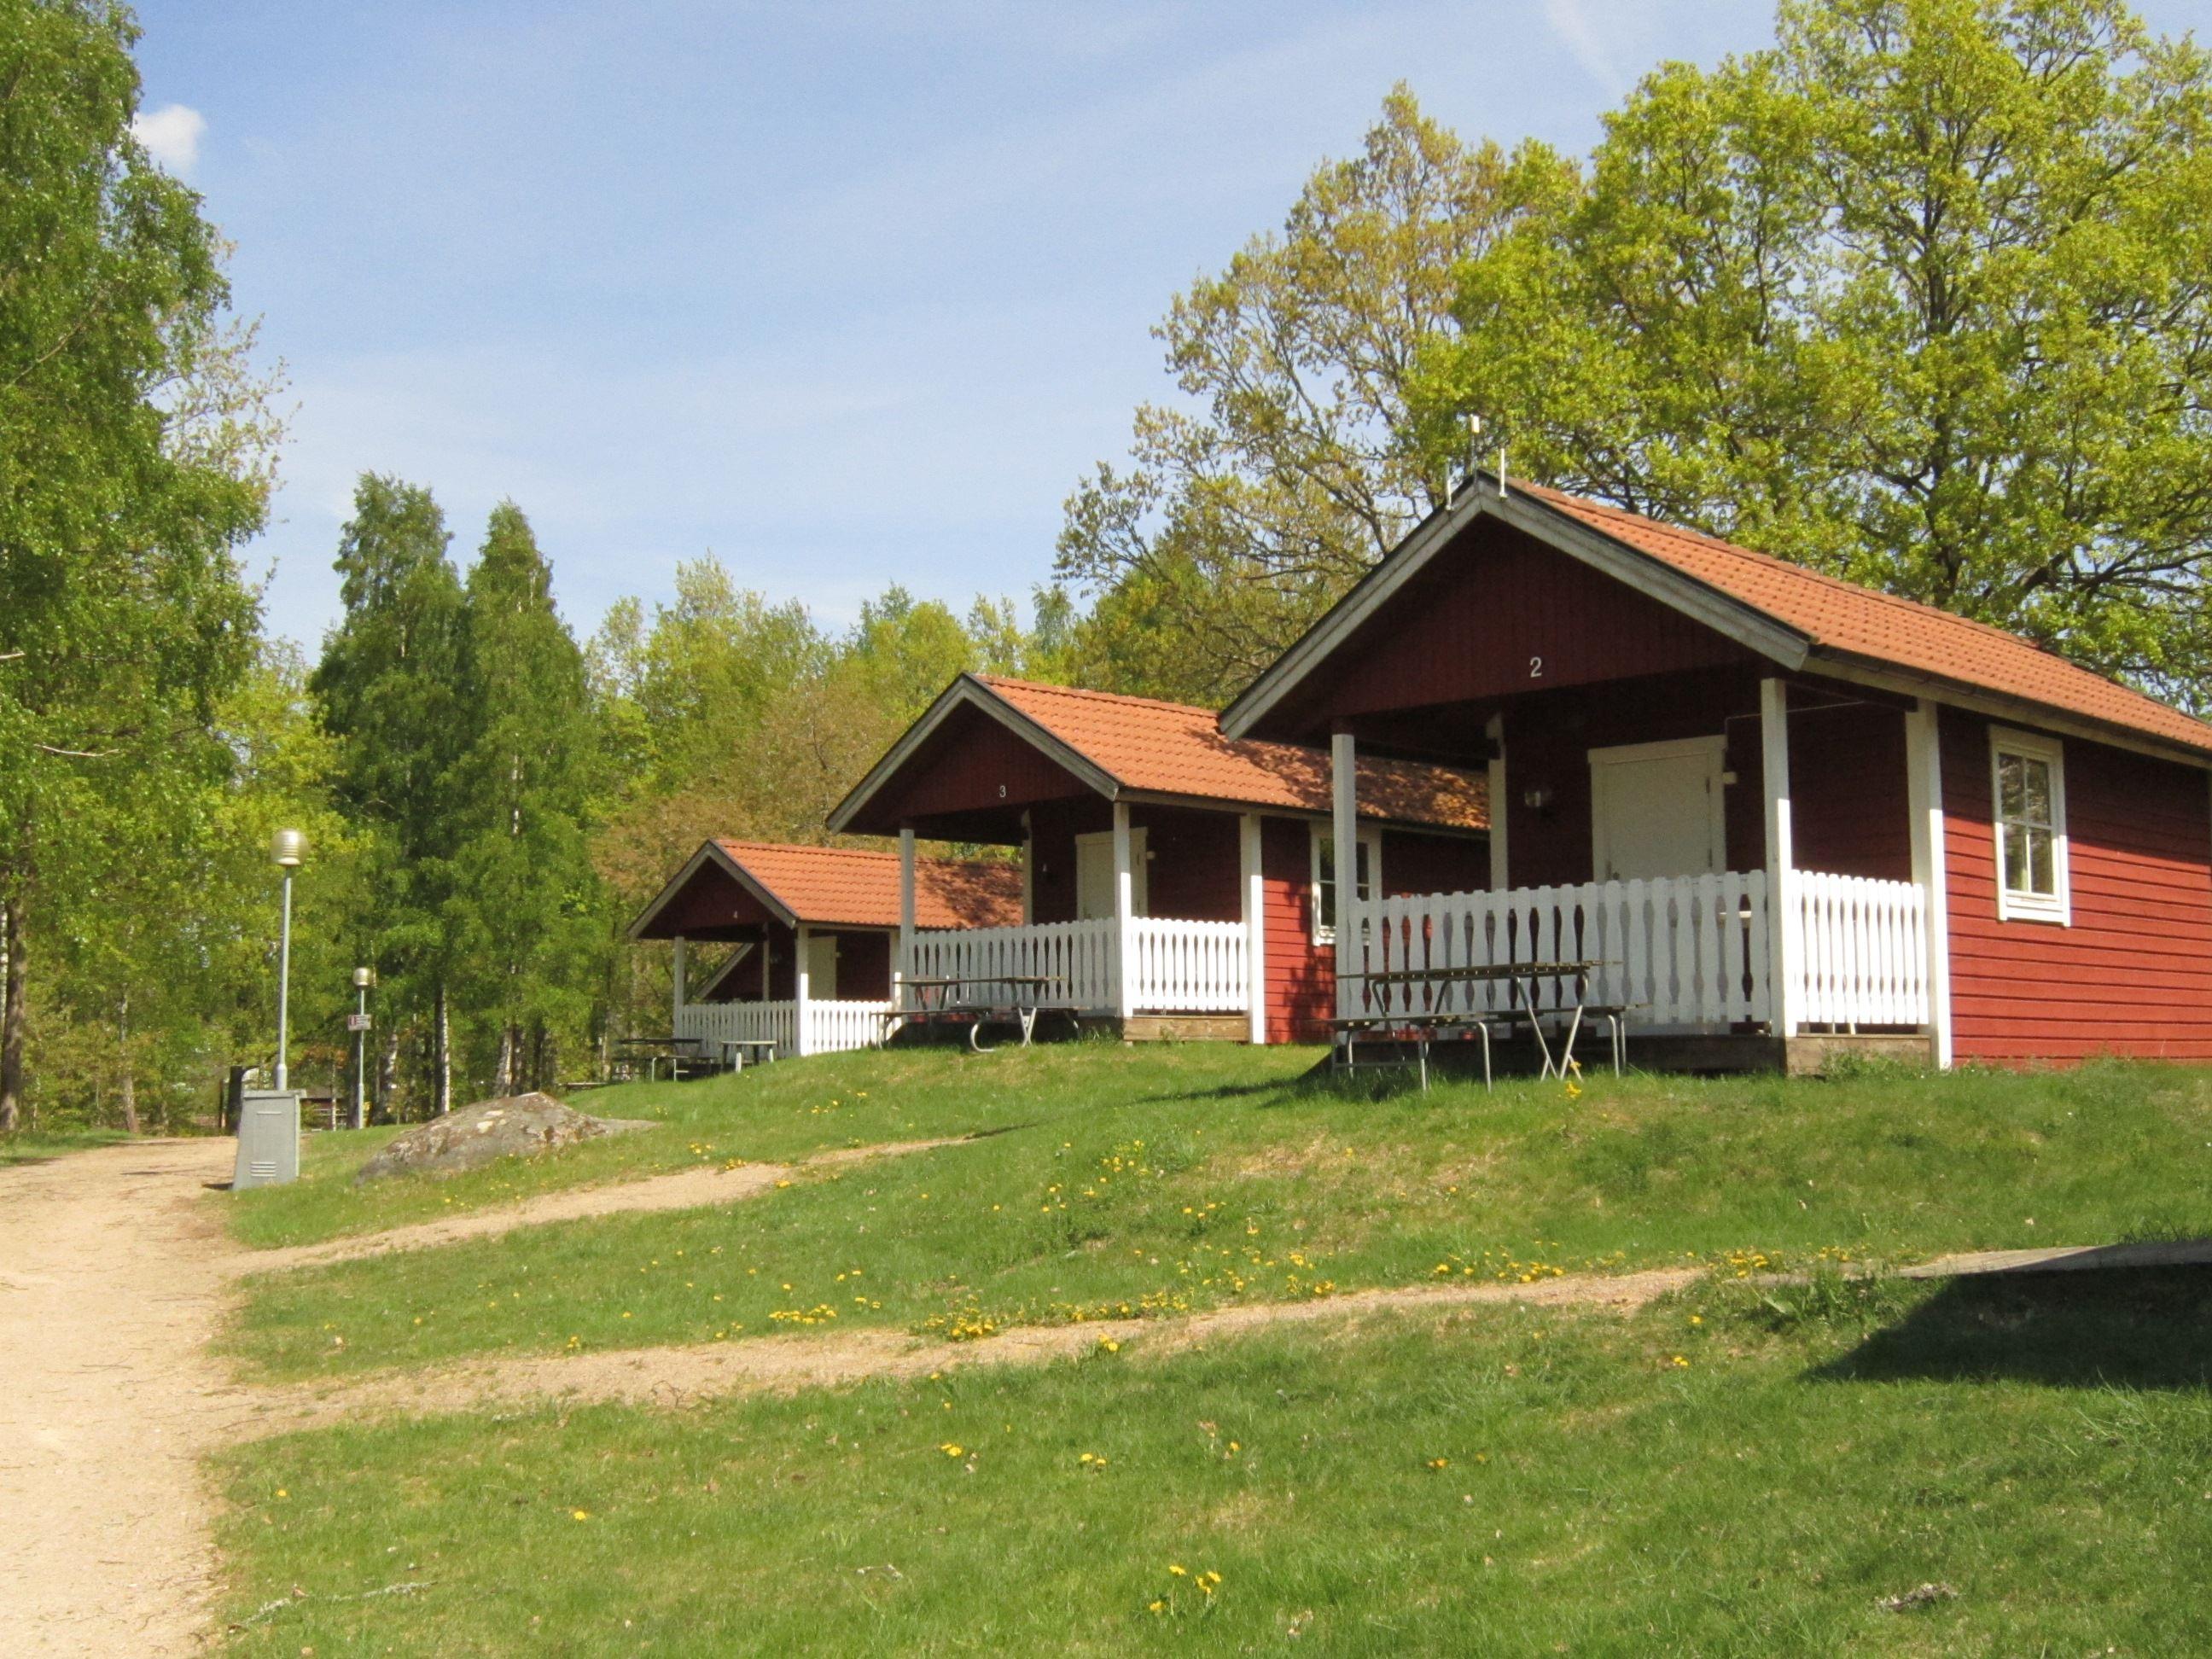 Osby Camping / Stugor